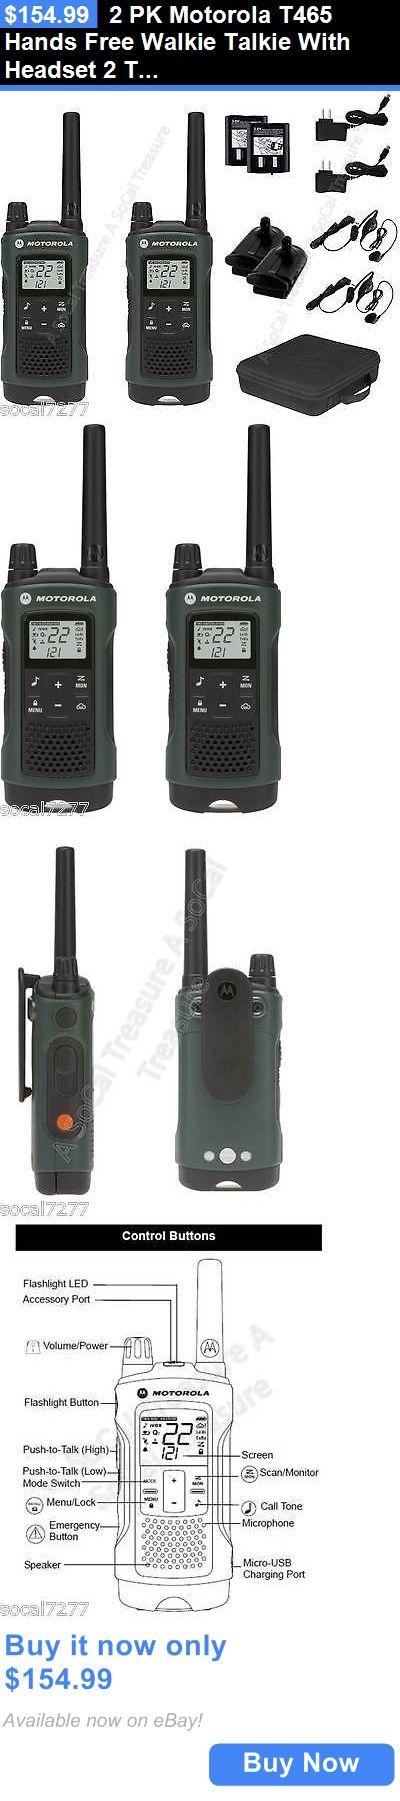 Walkie Talkies Two-Way Radios: 2 Pk Motorola T465 Hands Free Walkie Talkie With Headset 2 Two Way Radio S Gmrs BUY IT NOW ONLY: $154.99